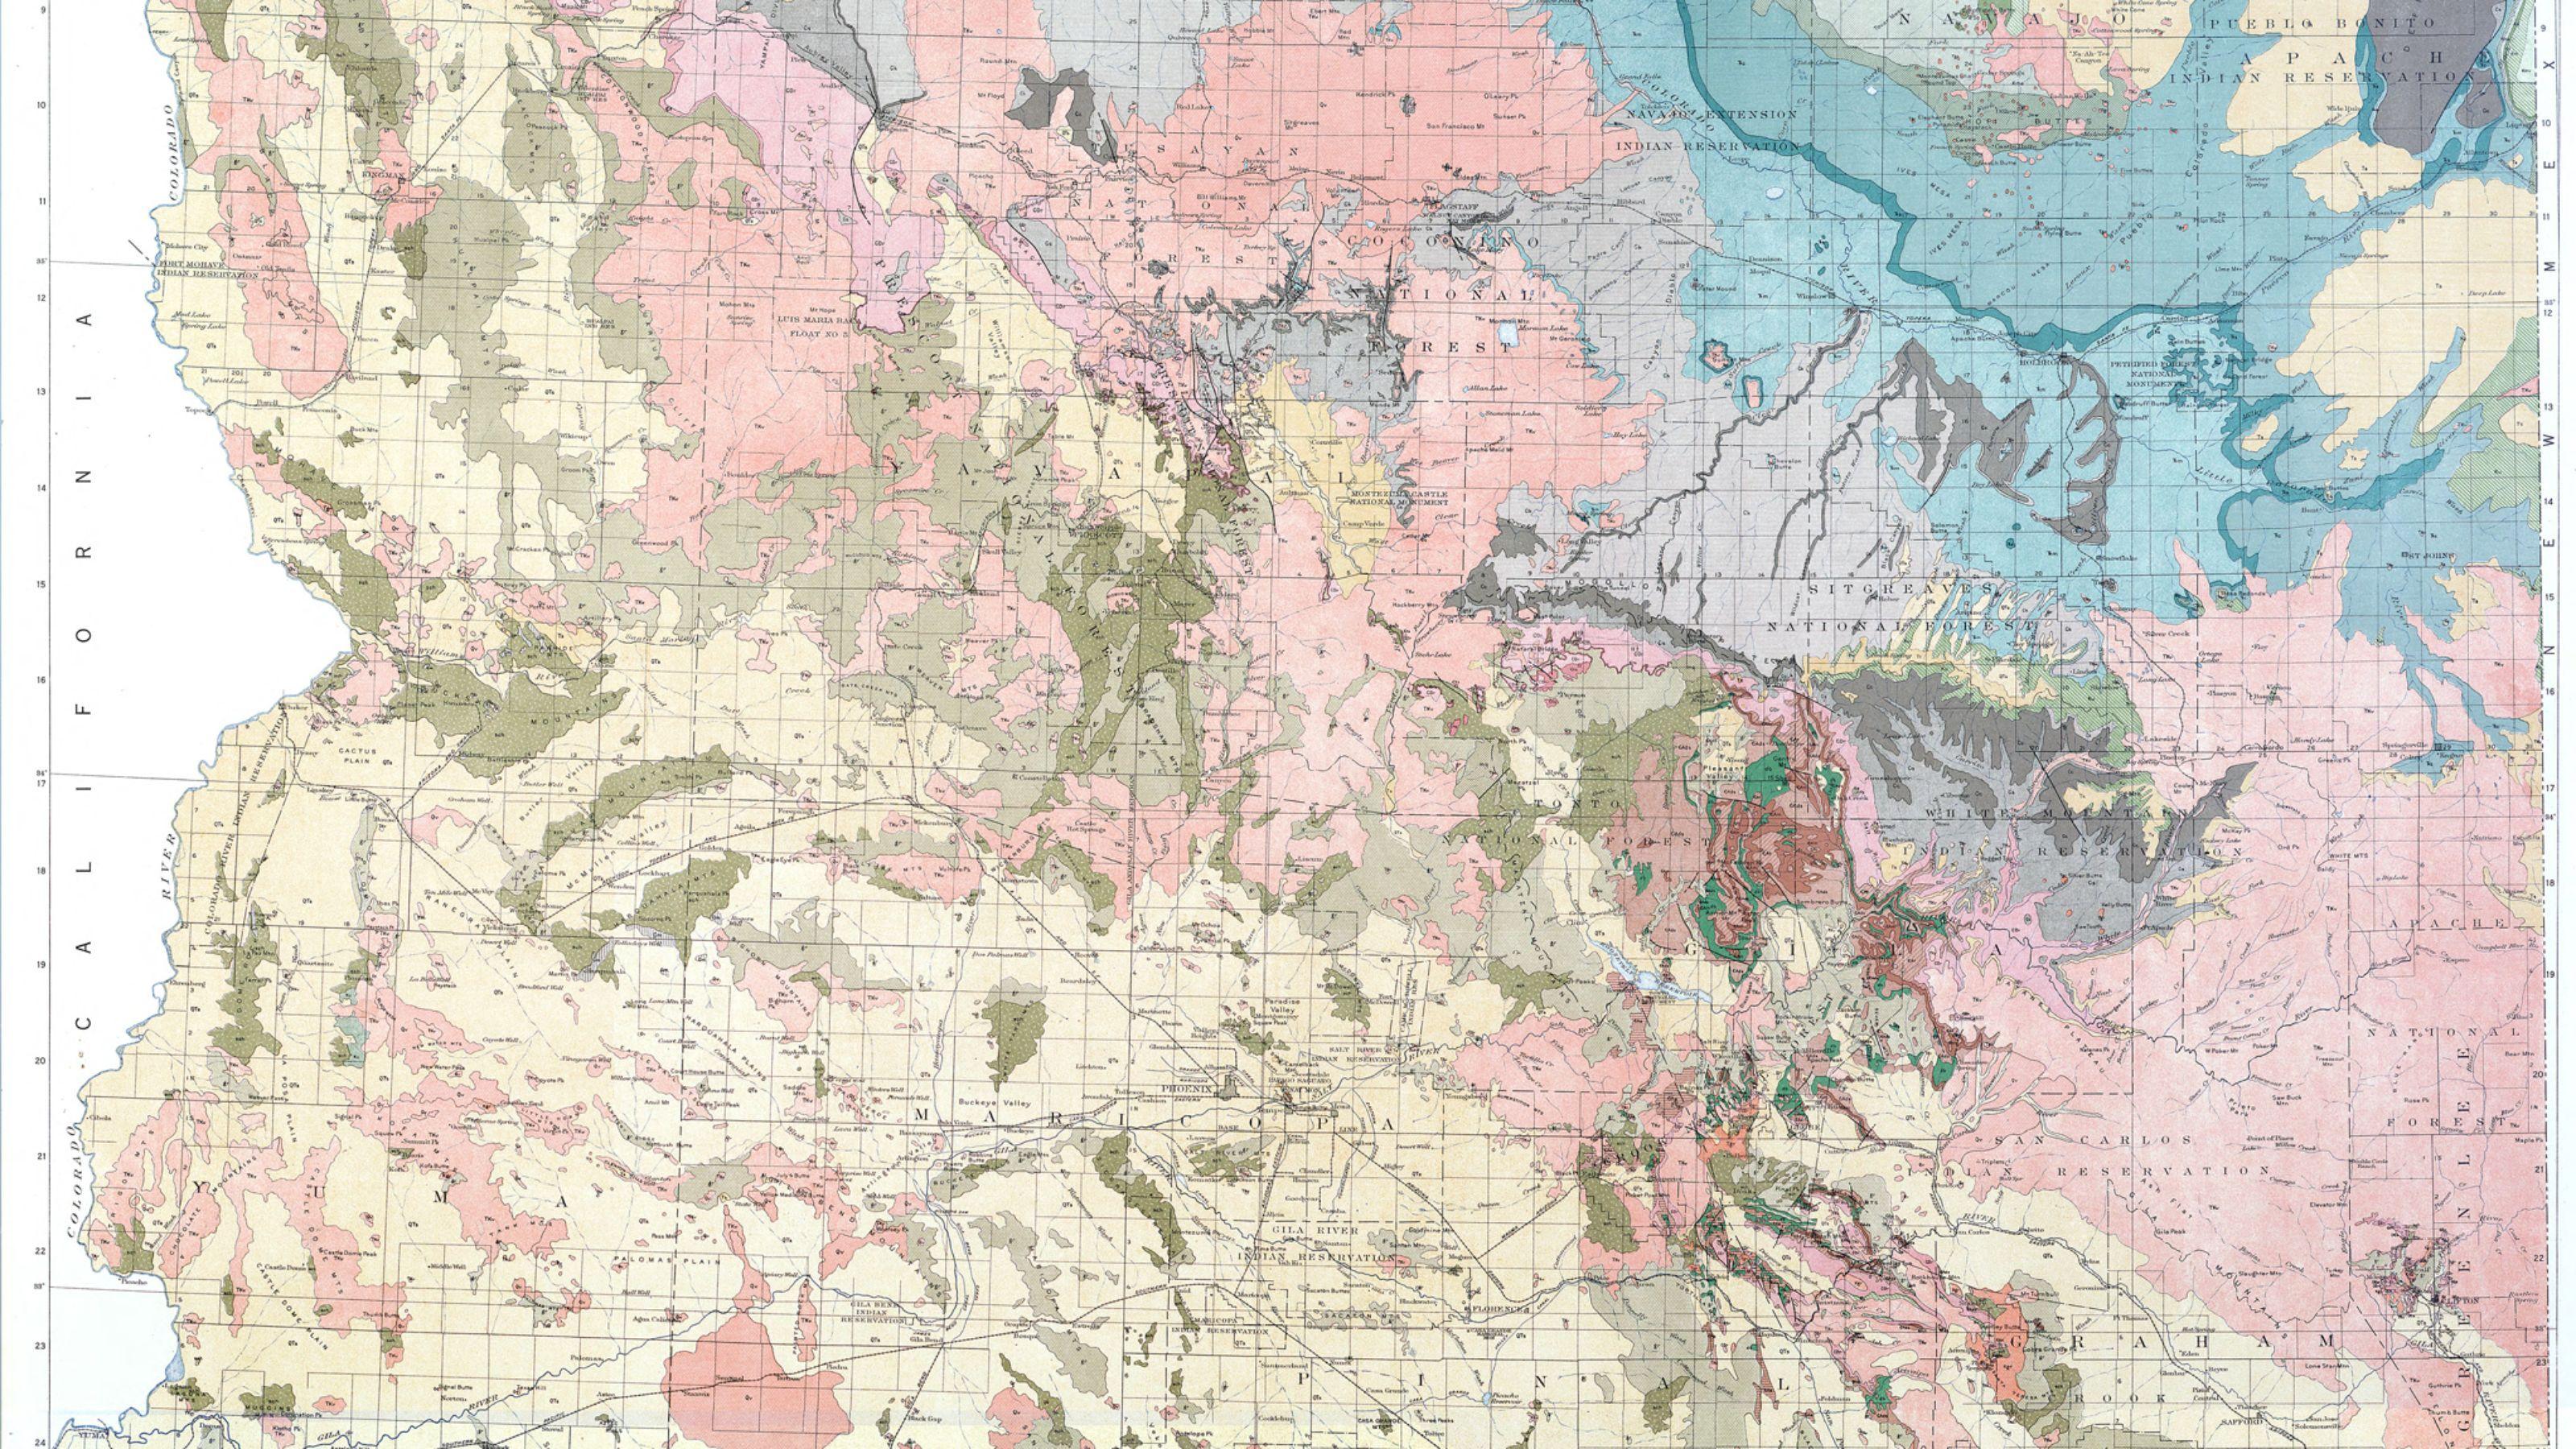 Geologic Map Of Arizona.Geologic Map Of Arizona First State Wide Geologic Map Of Arizona